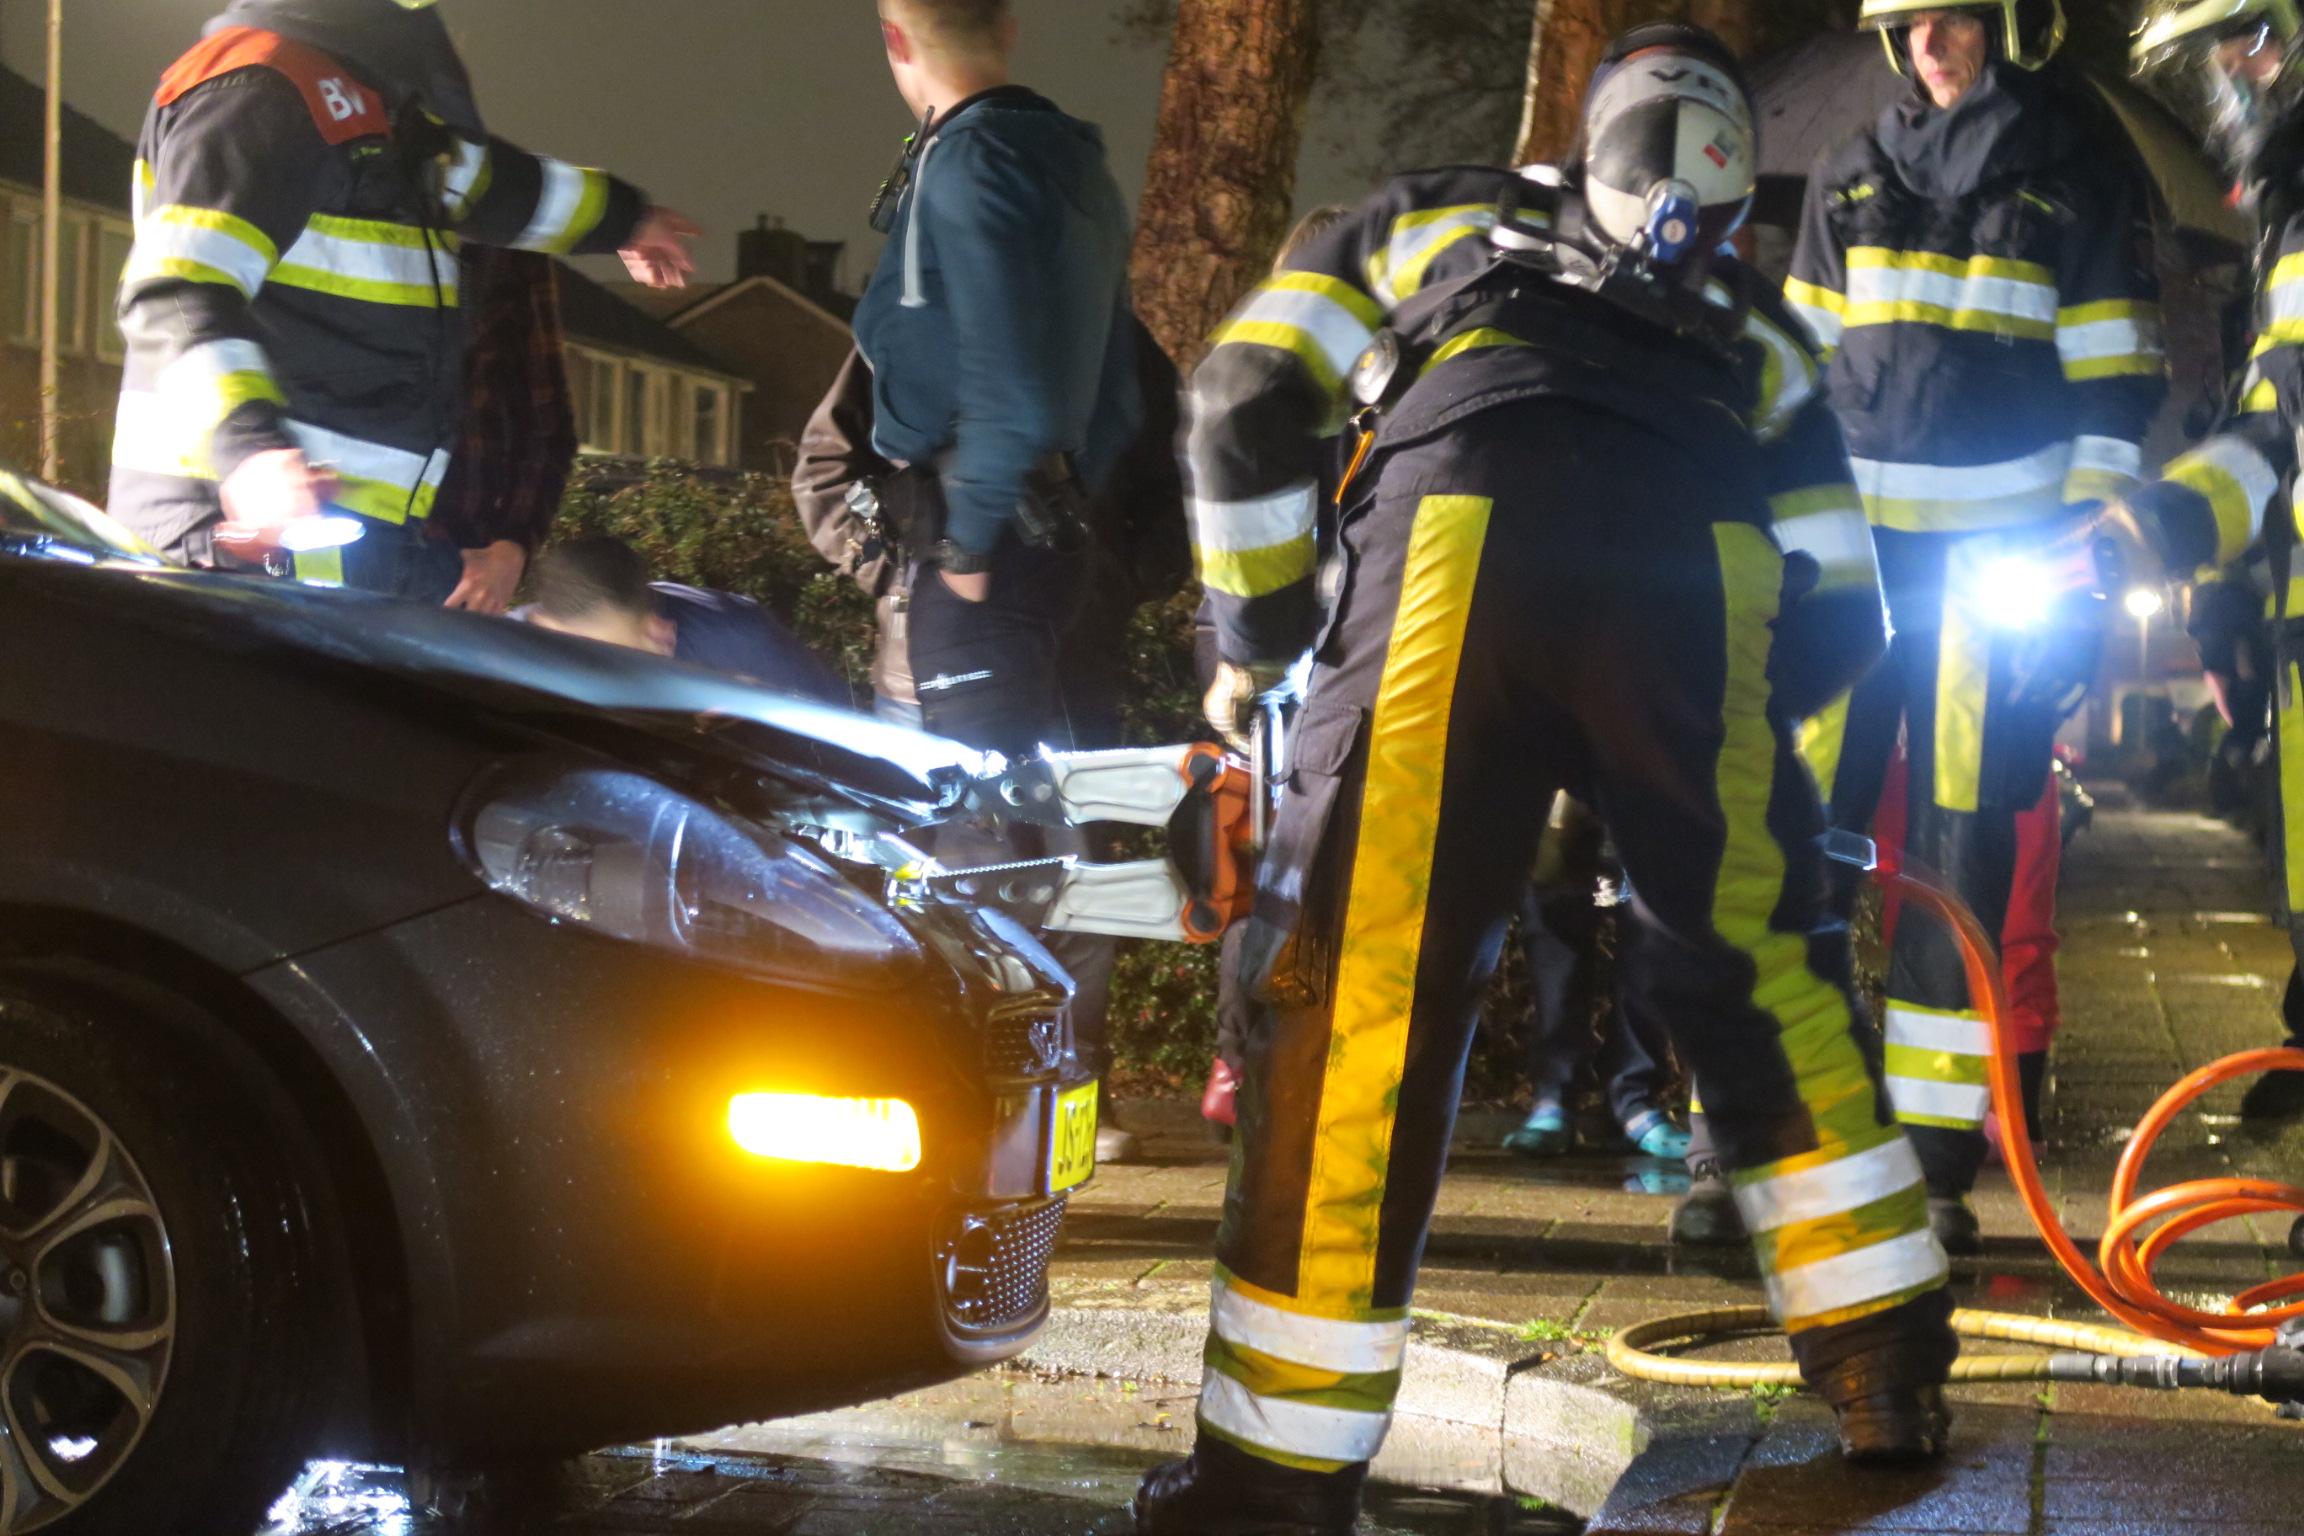 Autobrand in Drachten bewoners horen harde knal